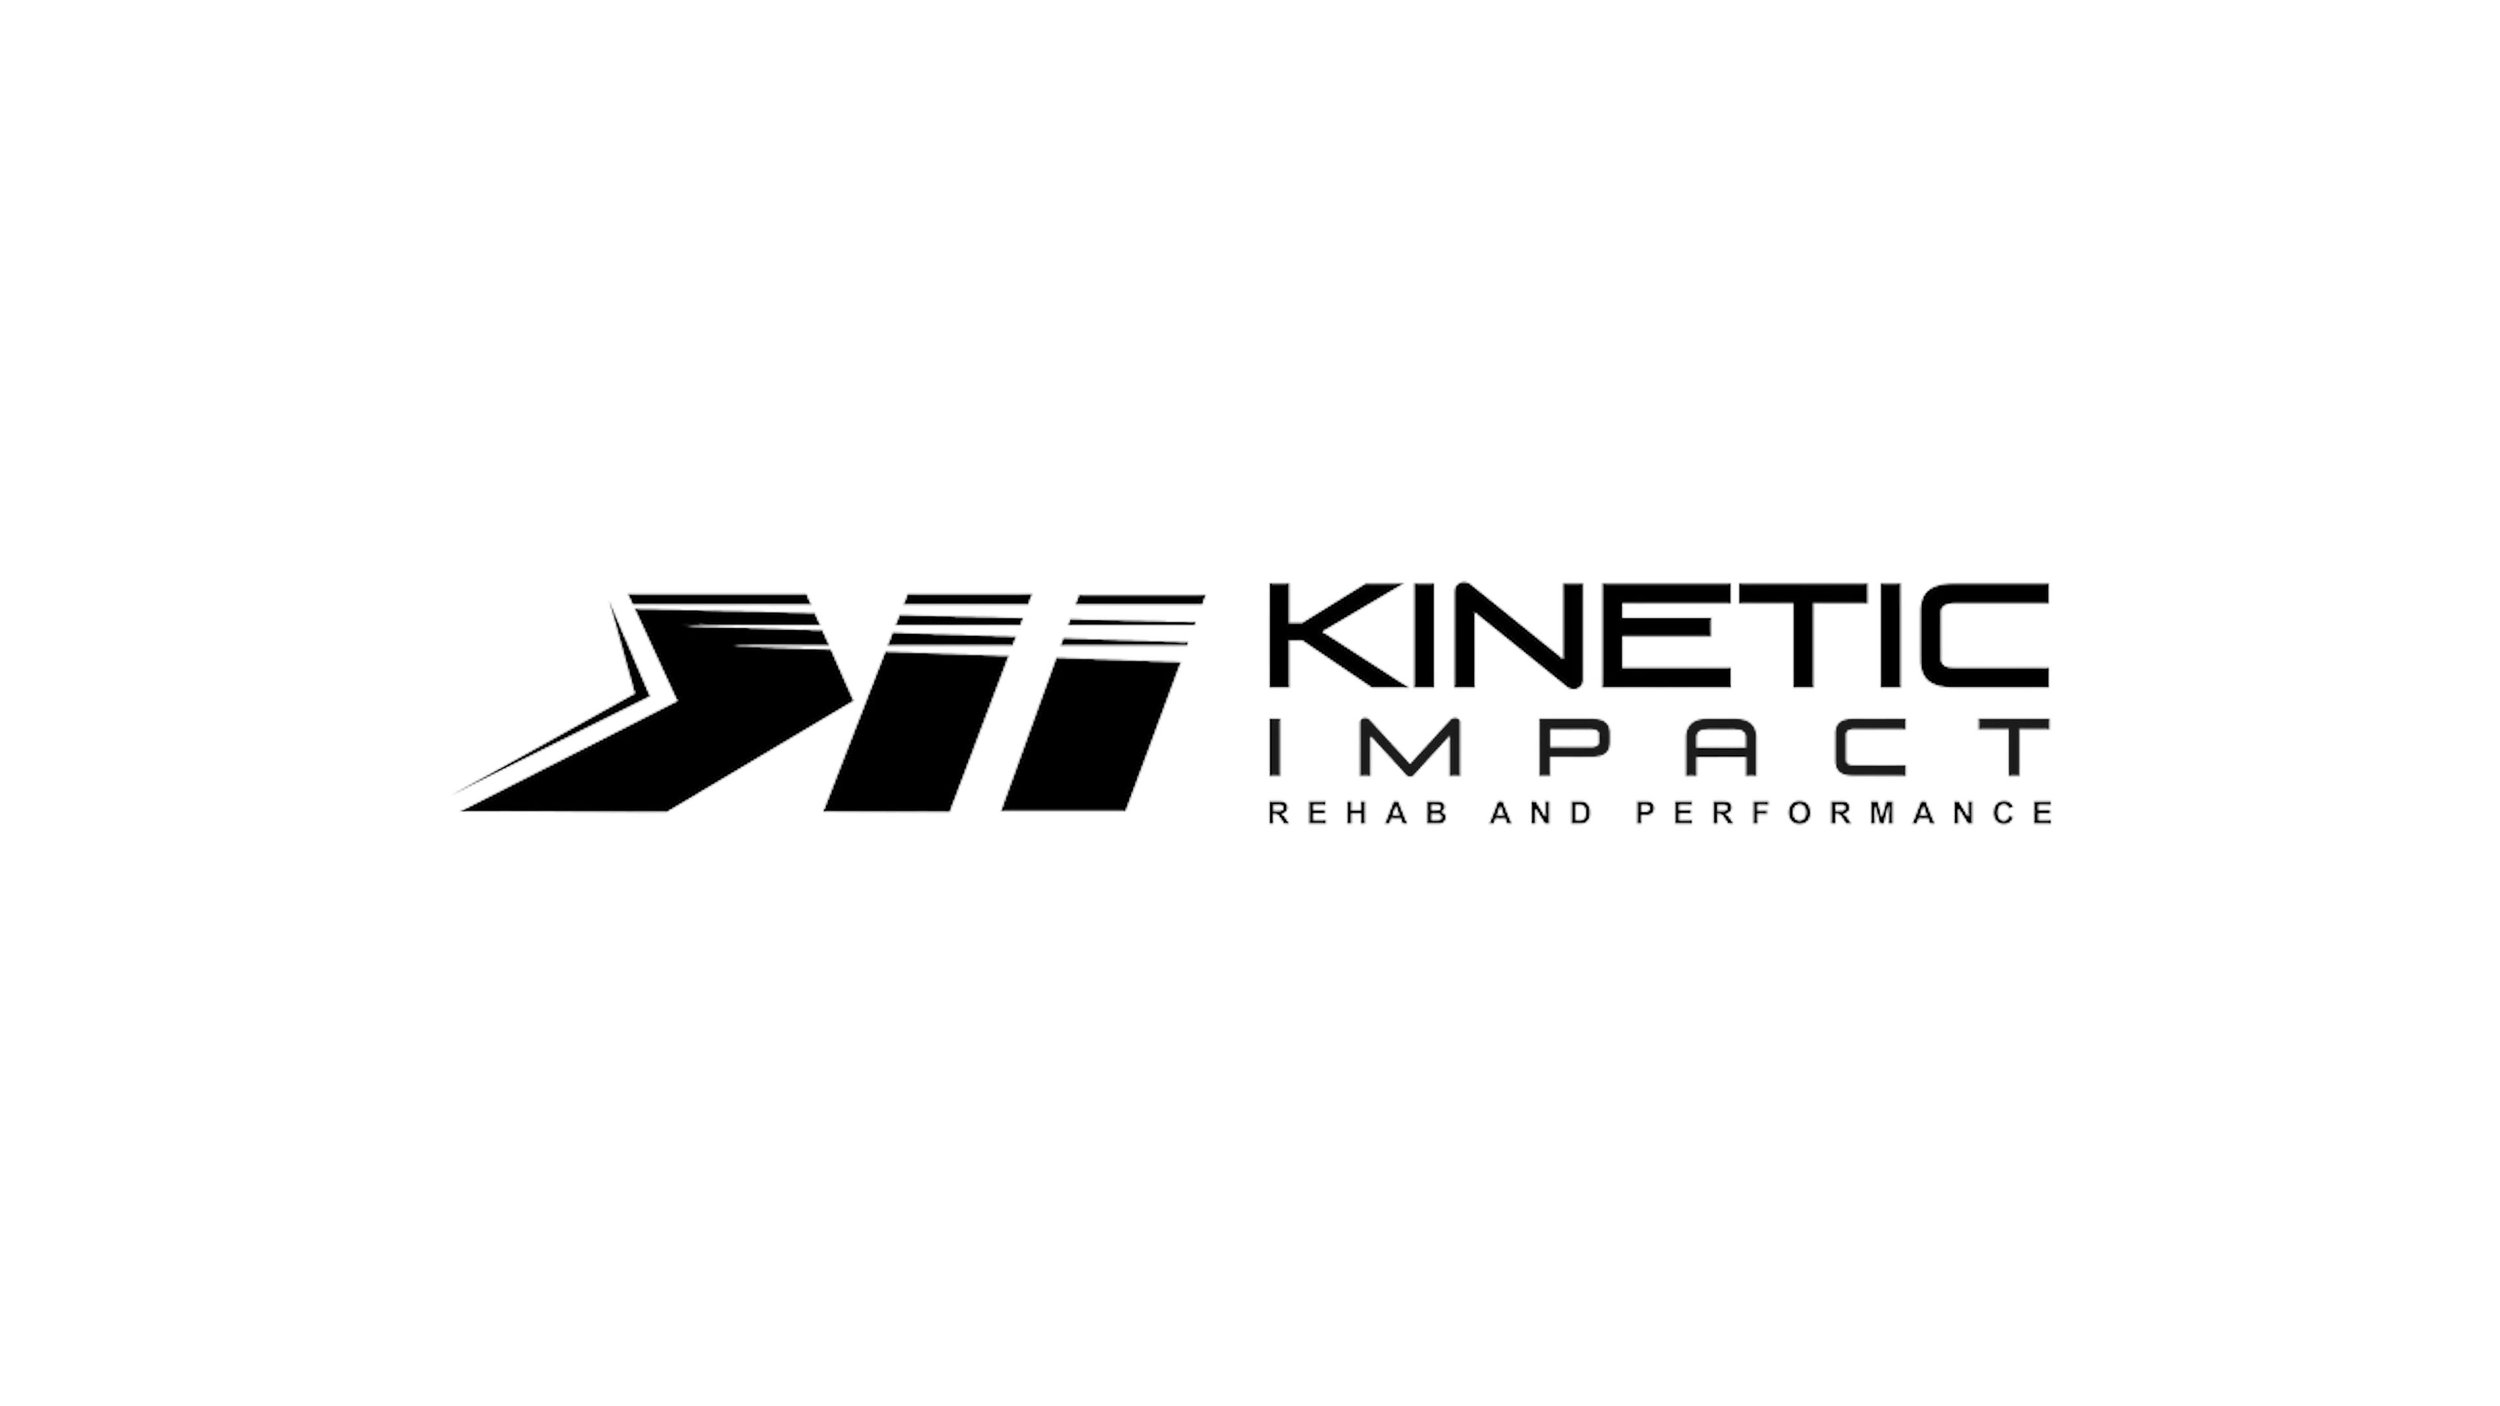 Kinetic Impact Rehab & Performance